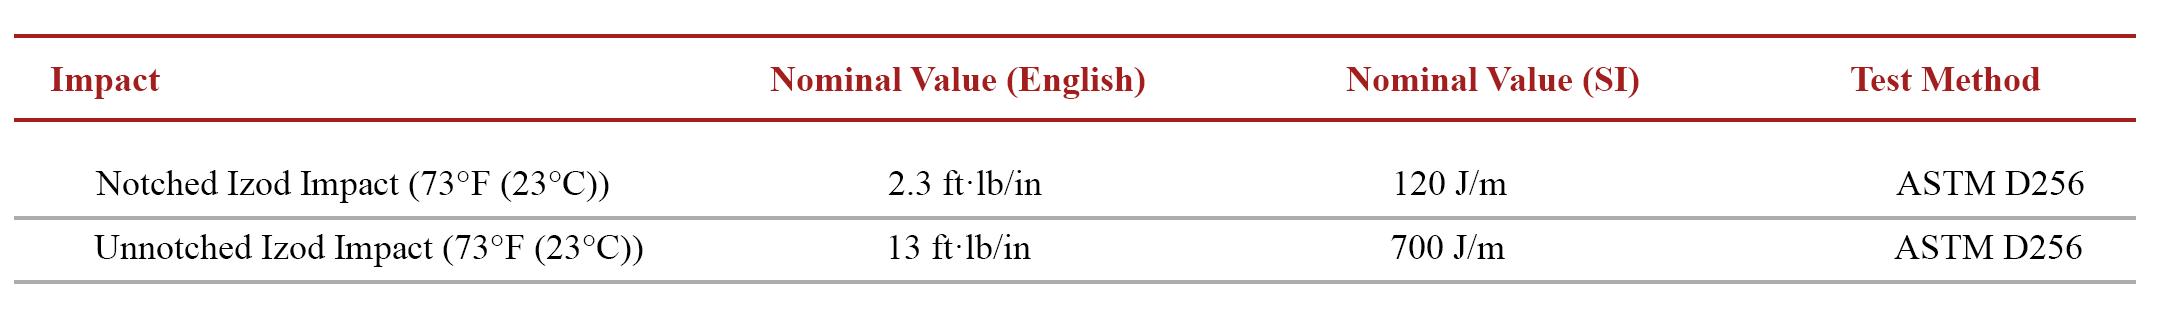 Tabelle 2: Gapex® HP RPP20EU98HB